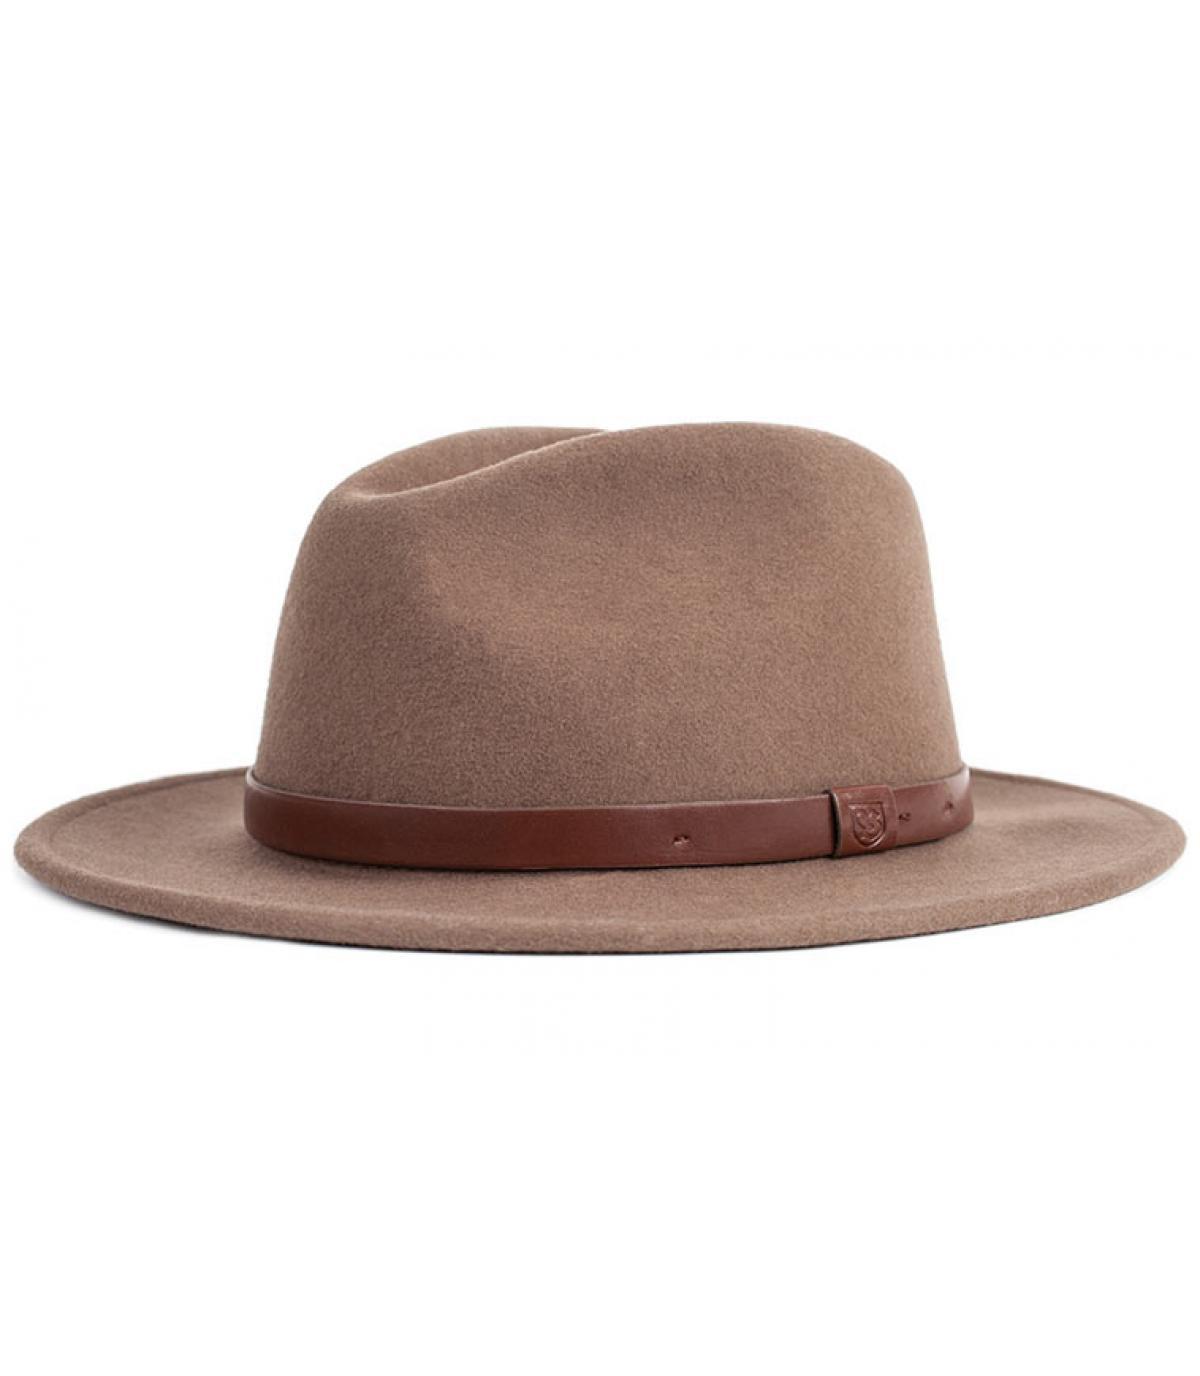 Camel men fedora hat - Messer fedora camel by Brixton. b55923598a9